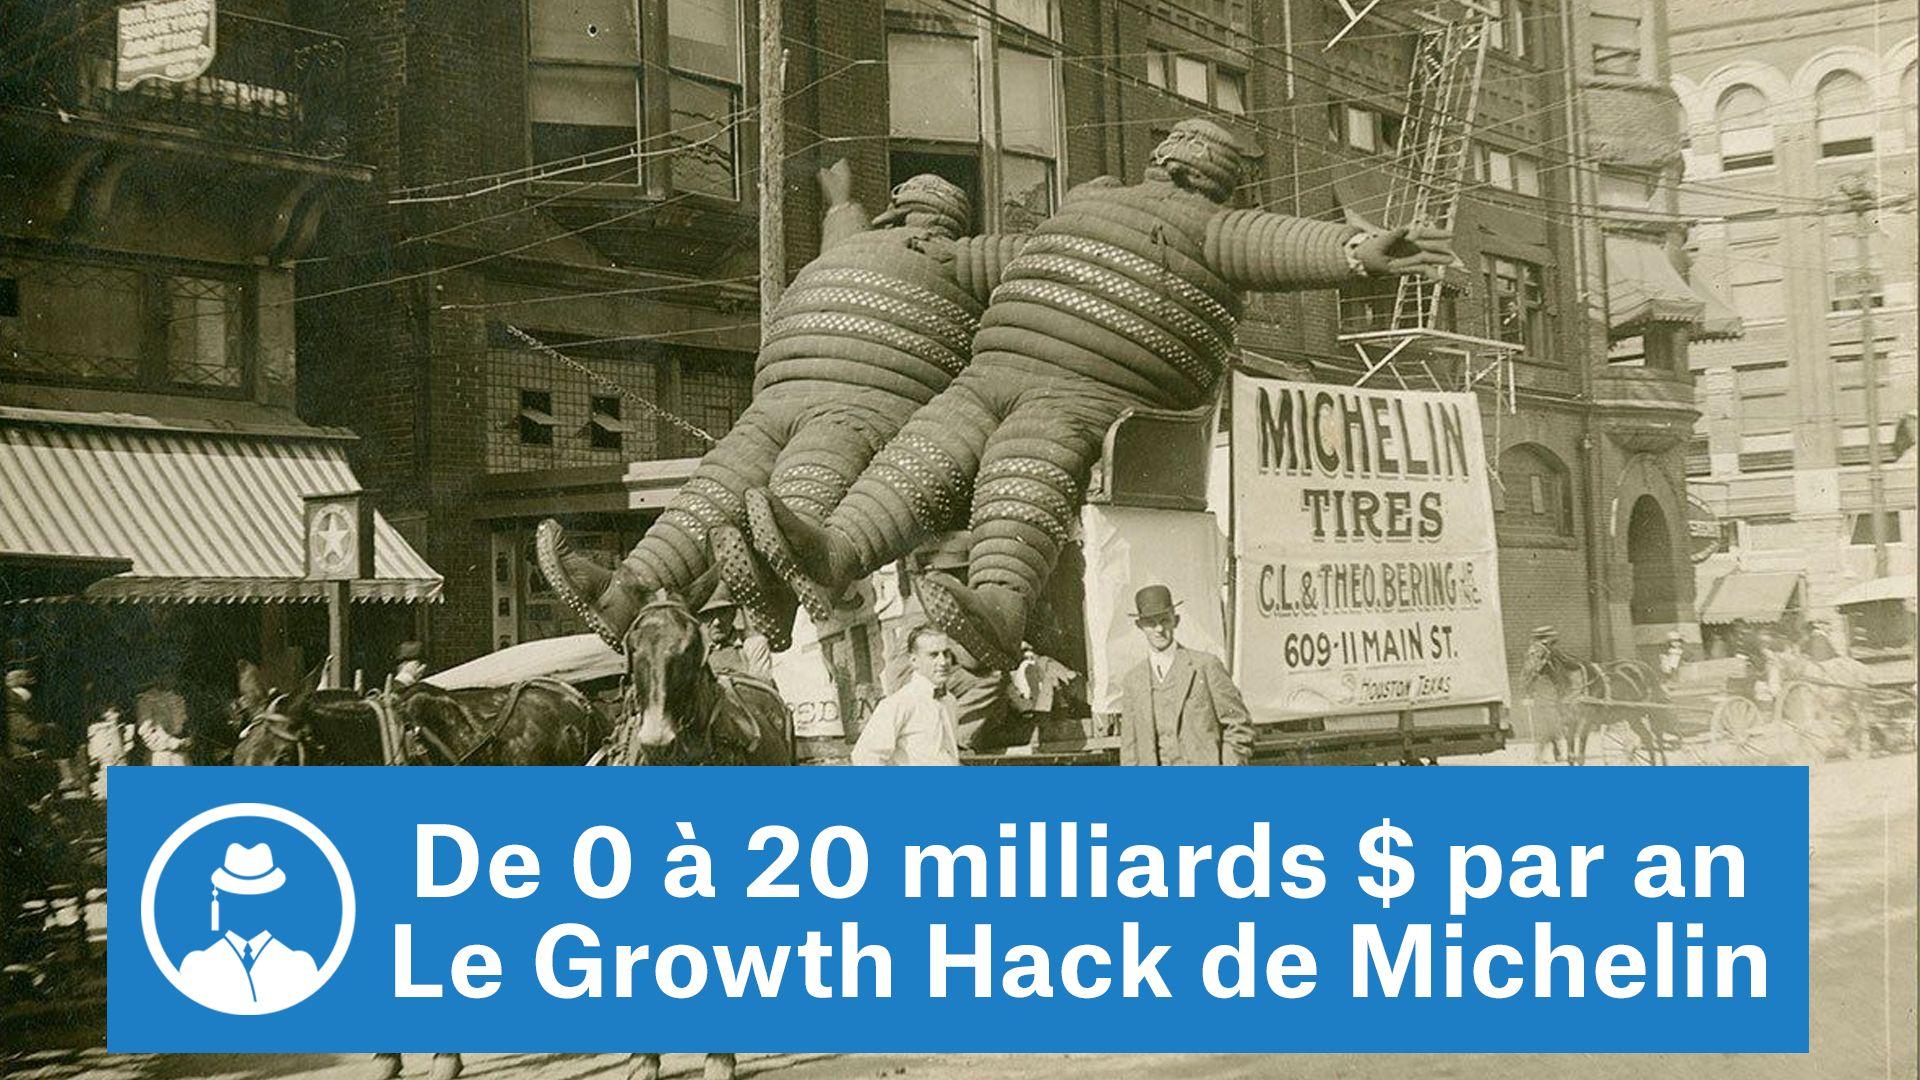 De 0 à 20 milliards de dollars par an (Growth Hack de Michelin) #GrowthHacking #WebMarketing #FormationGrowthHacking #CentreDeFormationFrance #TunnelAARRR #AARRR #SocialMedia #CommunityManagement #SEO #Michelin #GuideMichelin